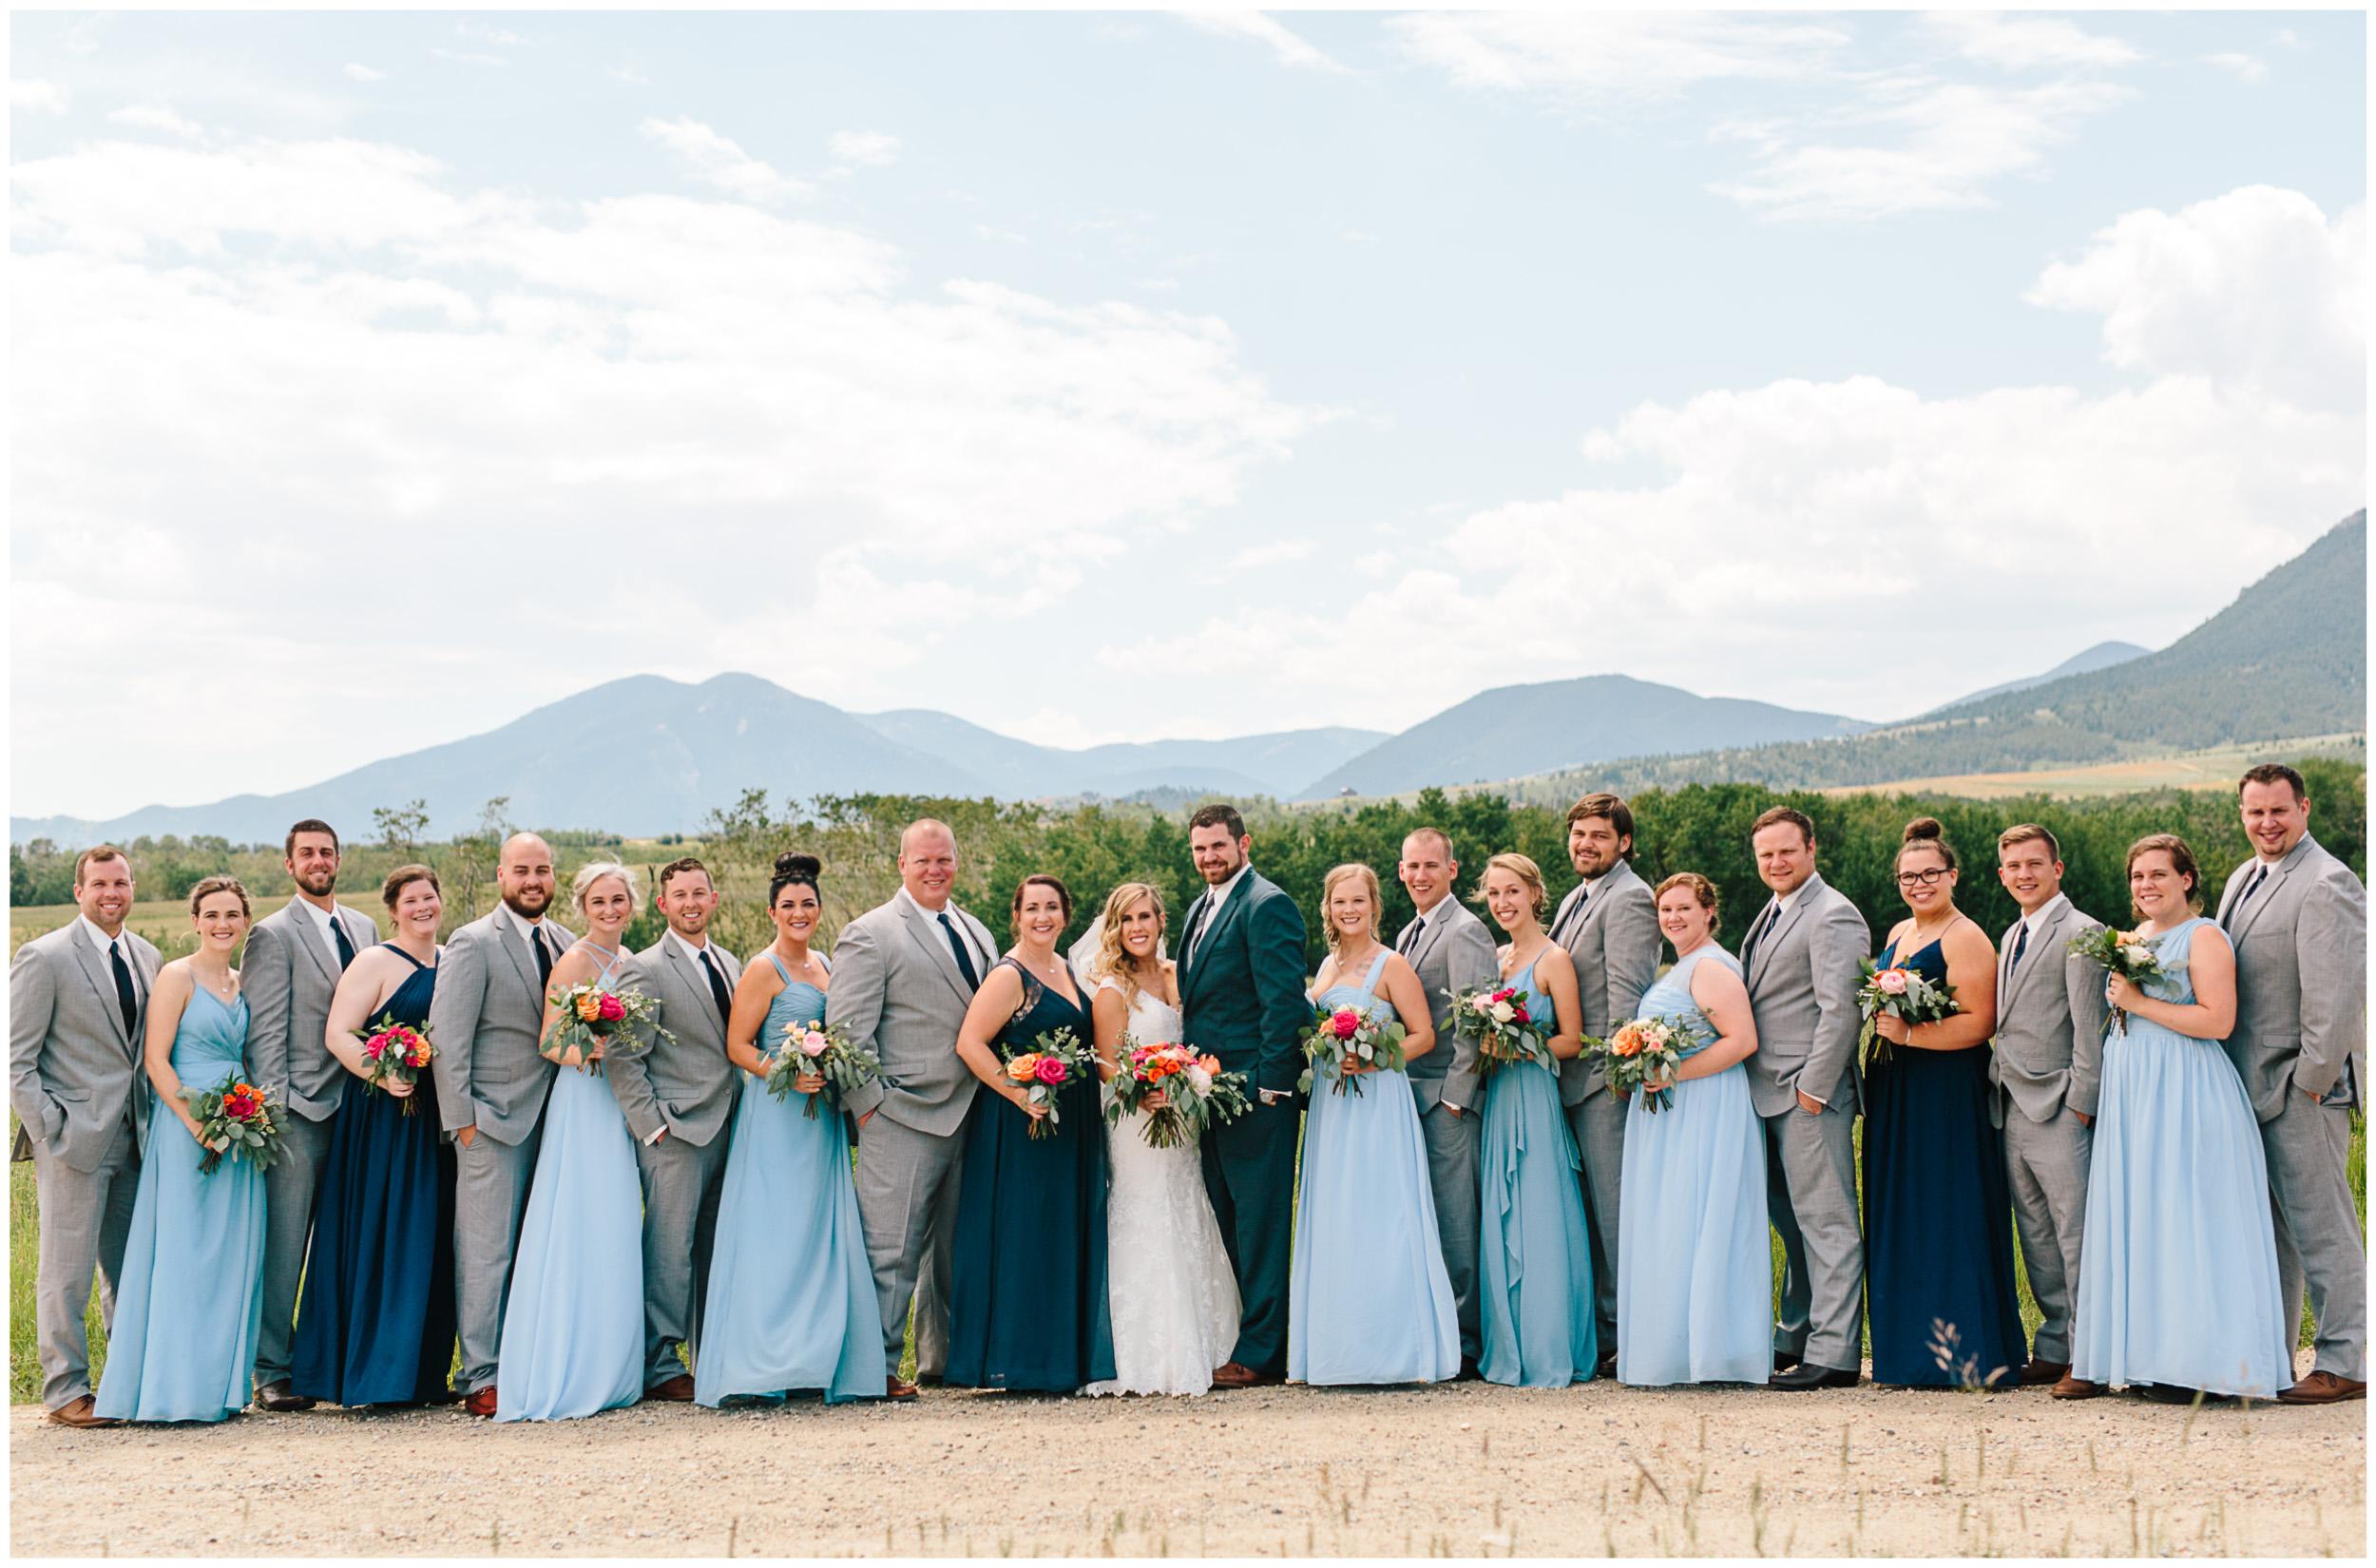 redlodge_montana_wedding_48.jpg